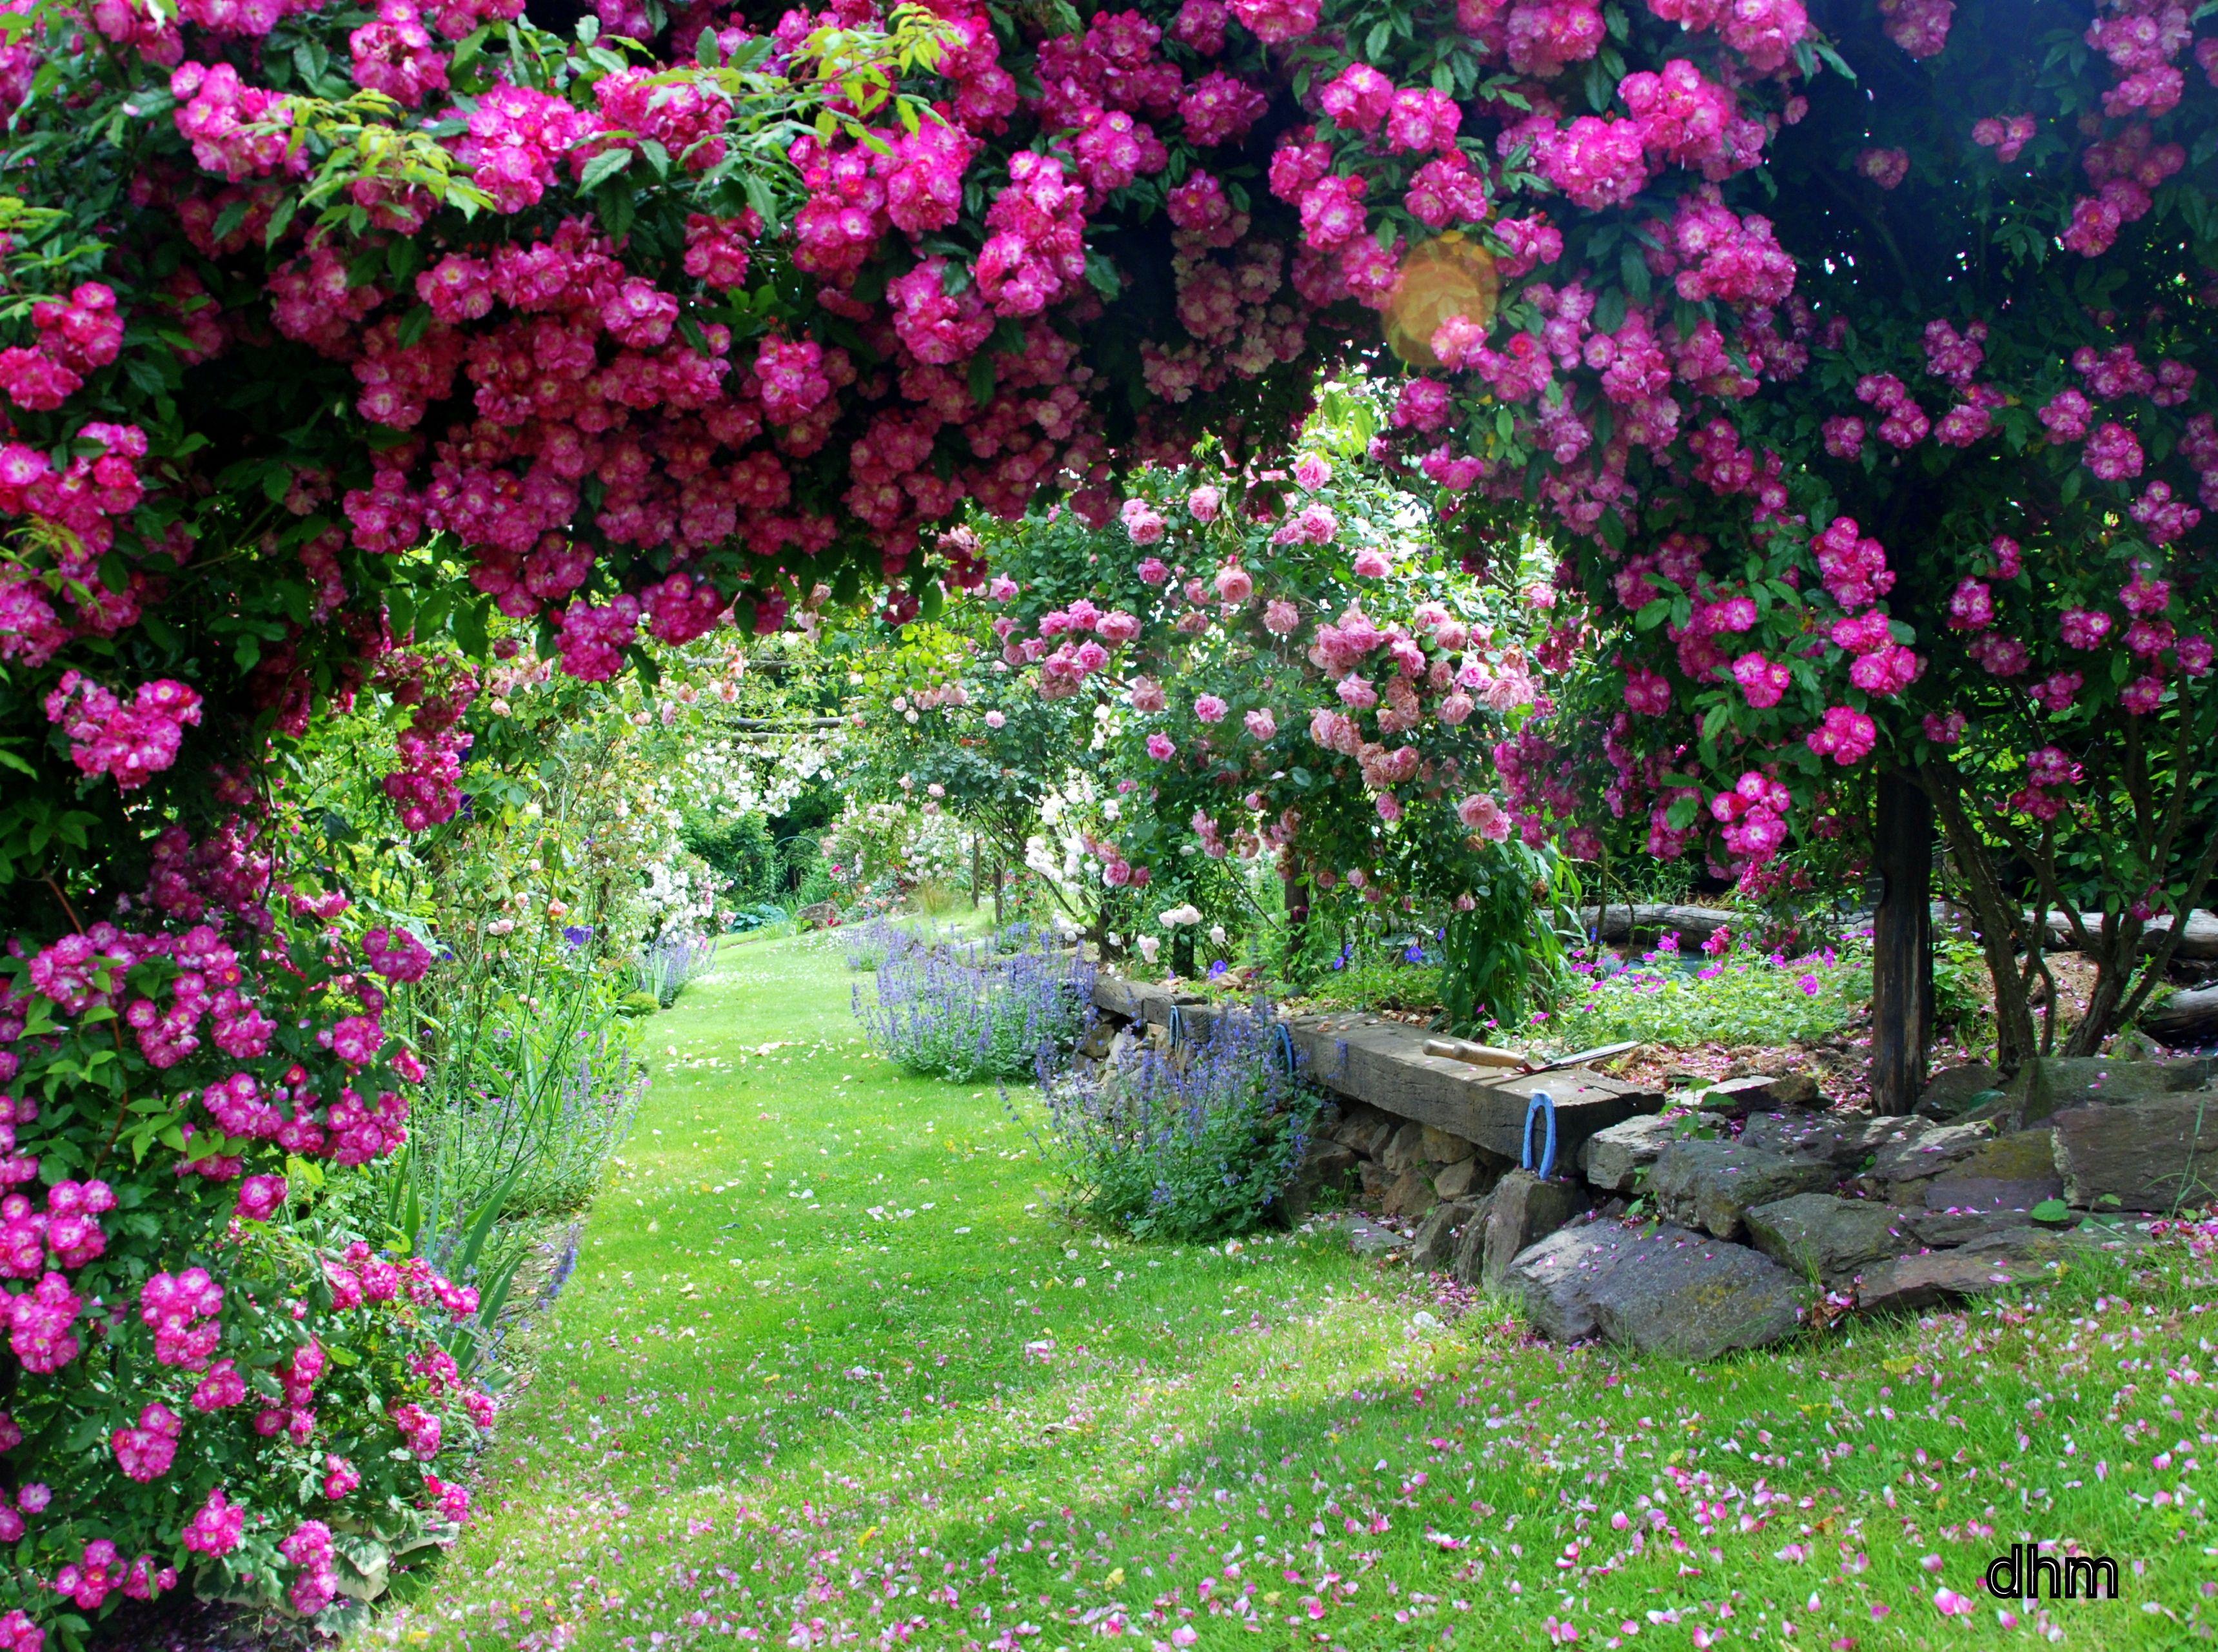 jardin magnifique lilo du jardin au paysage. Black Bedroom Furniture Sets. Home Design Ideas